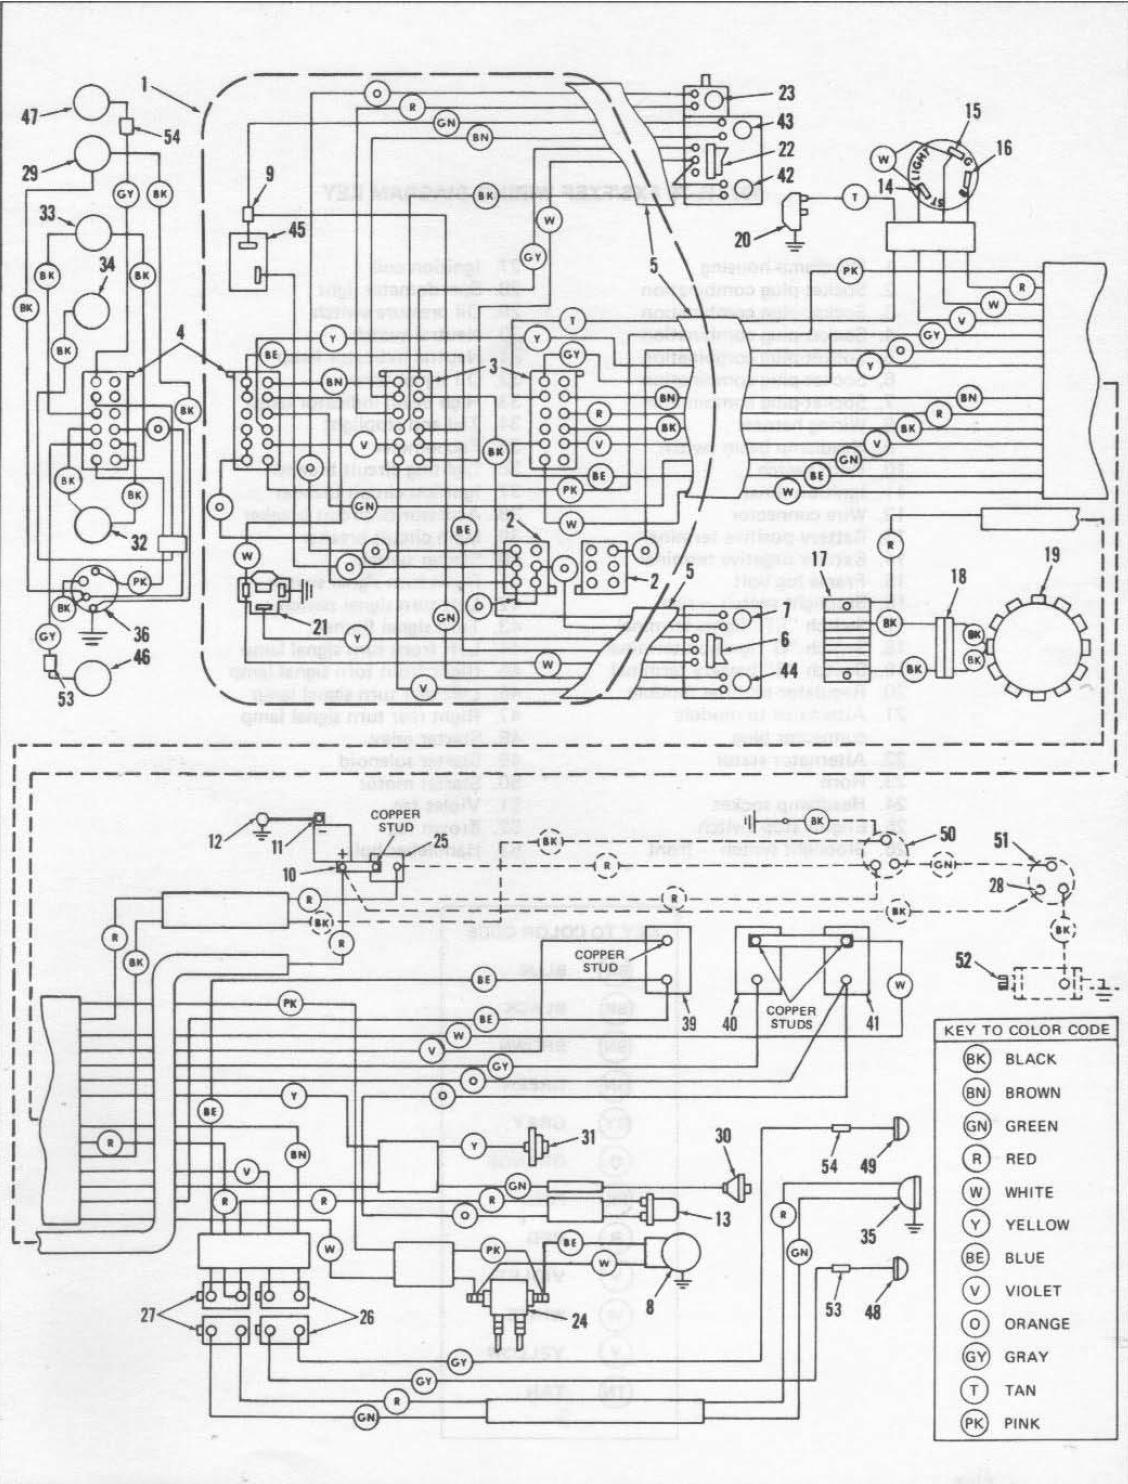 Kill switch wiring - Harley Davidson Forums on 3 wire spa motor wiring diagram, 1999 harley-davidson electra glide wiring diagram, motorcycle horn wiring diagram, mod box wiring diagram, honda obd1 fuel injector wiring diagram,